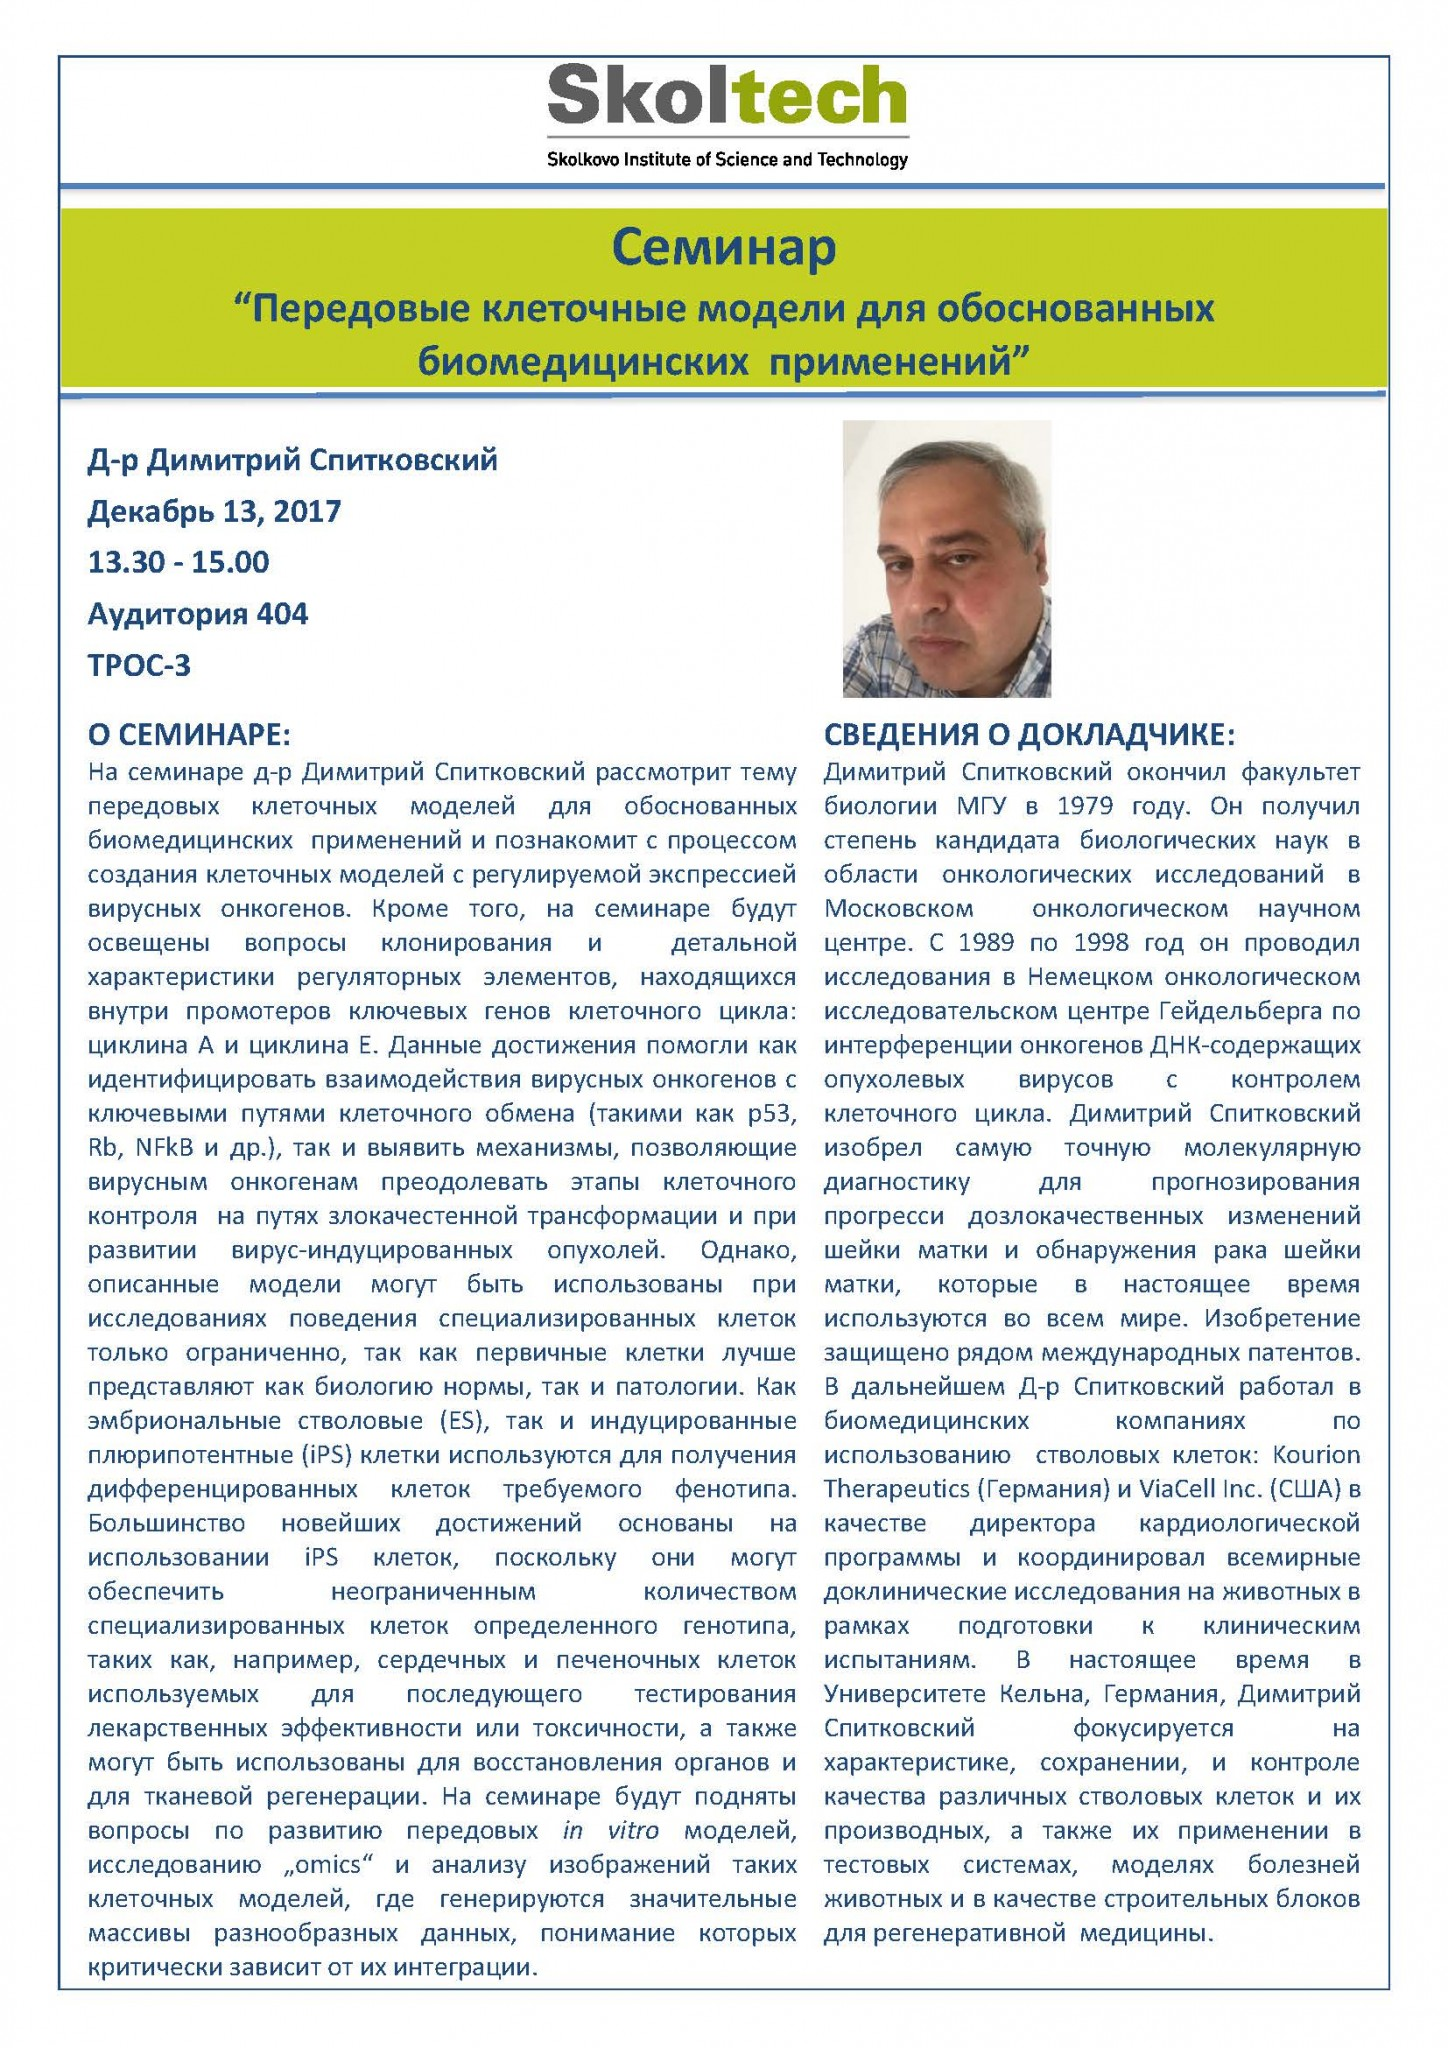 ds-seminar-announcement_dec-13_final_russian-version